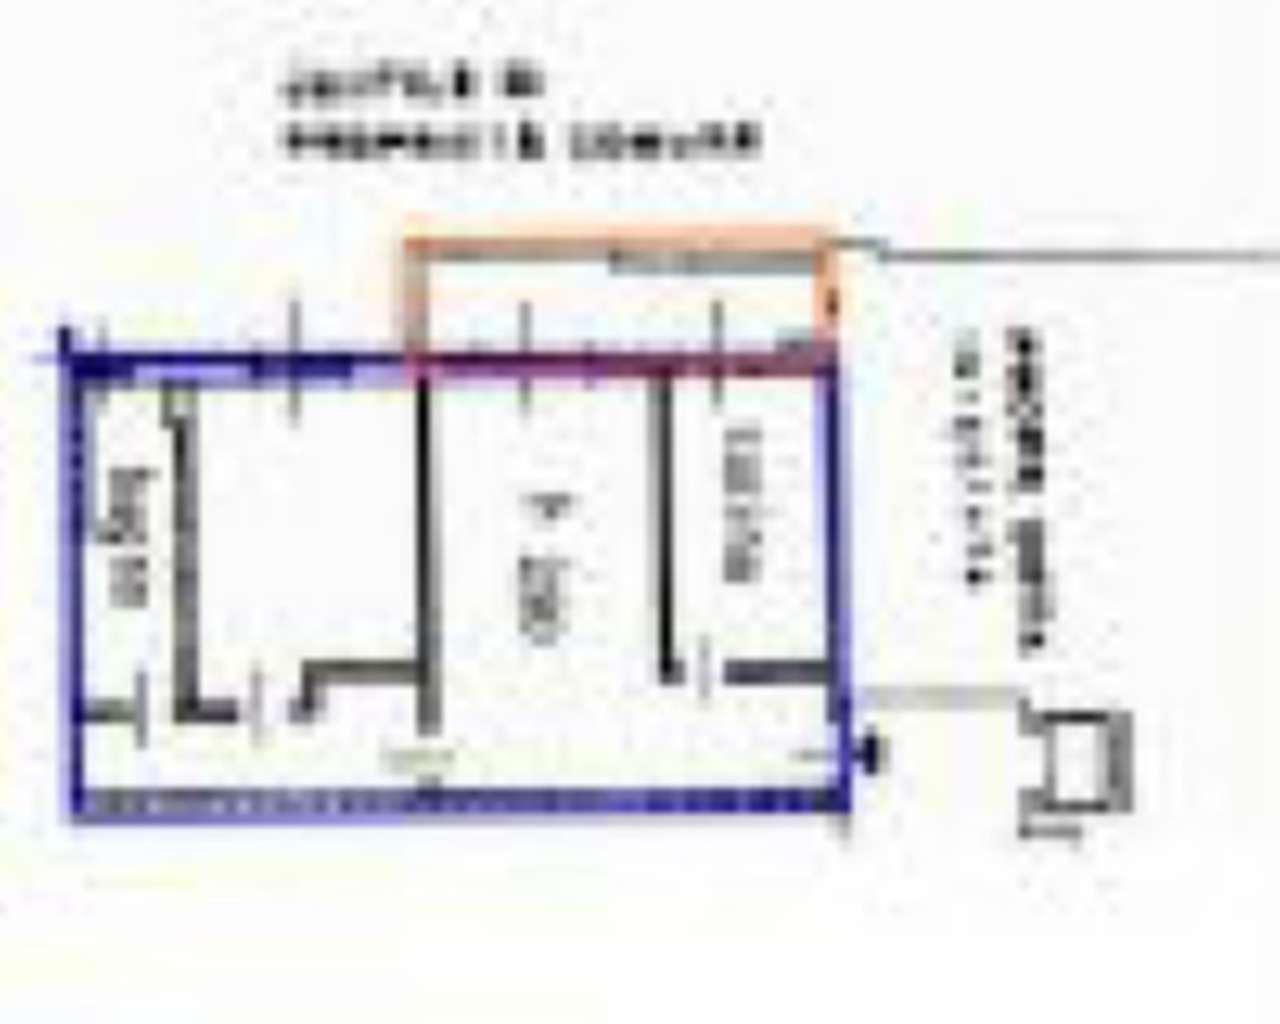 Vendita  bilocale Vimercate Via Armando Diaz 1 931225